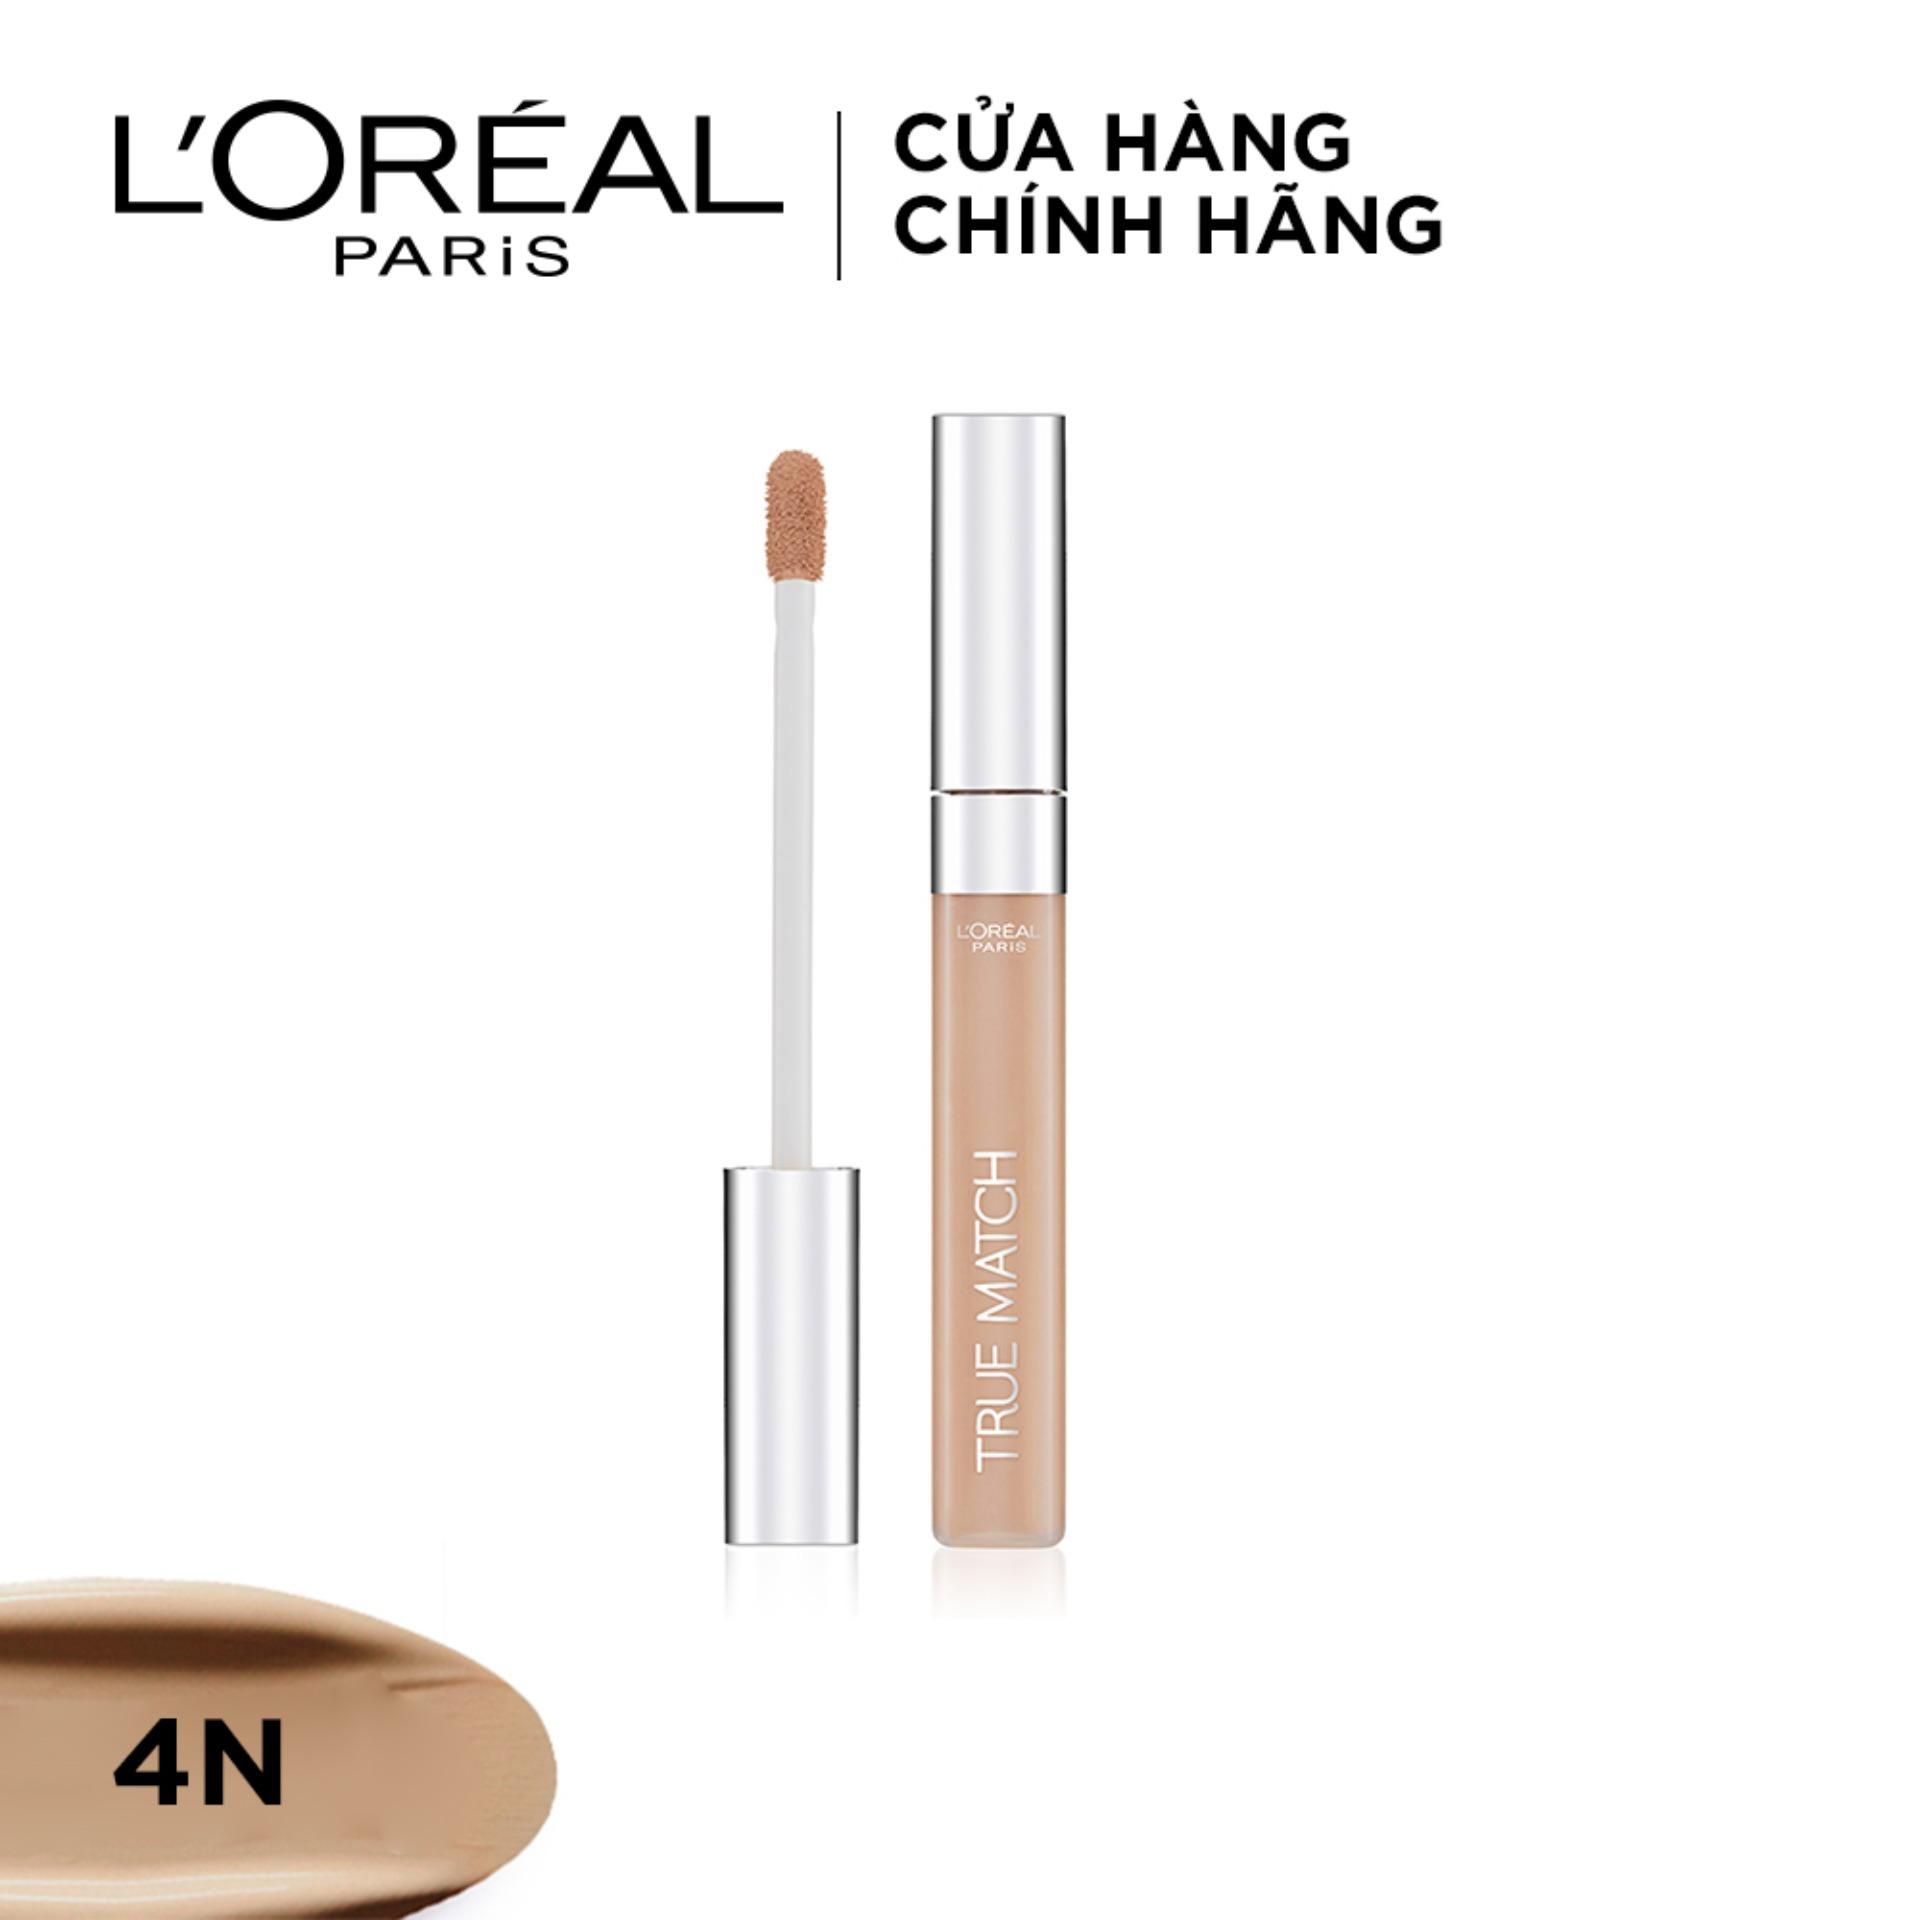 Kem che khuyết điểm LOreal Paris True Match The One Concealer 6.8ml nhập khẩu